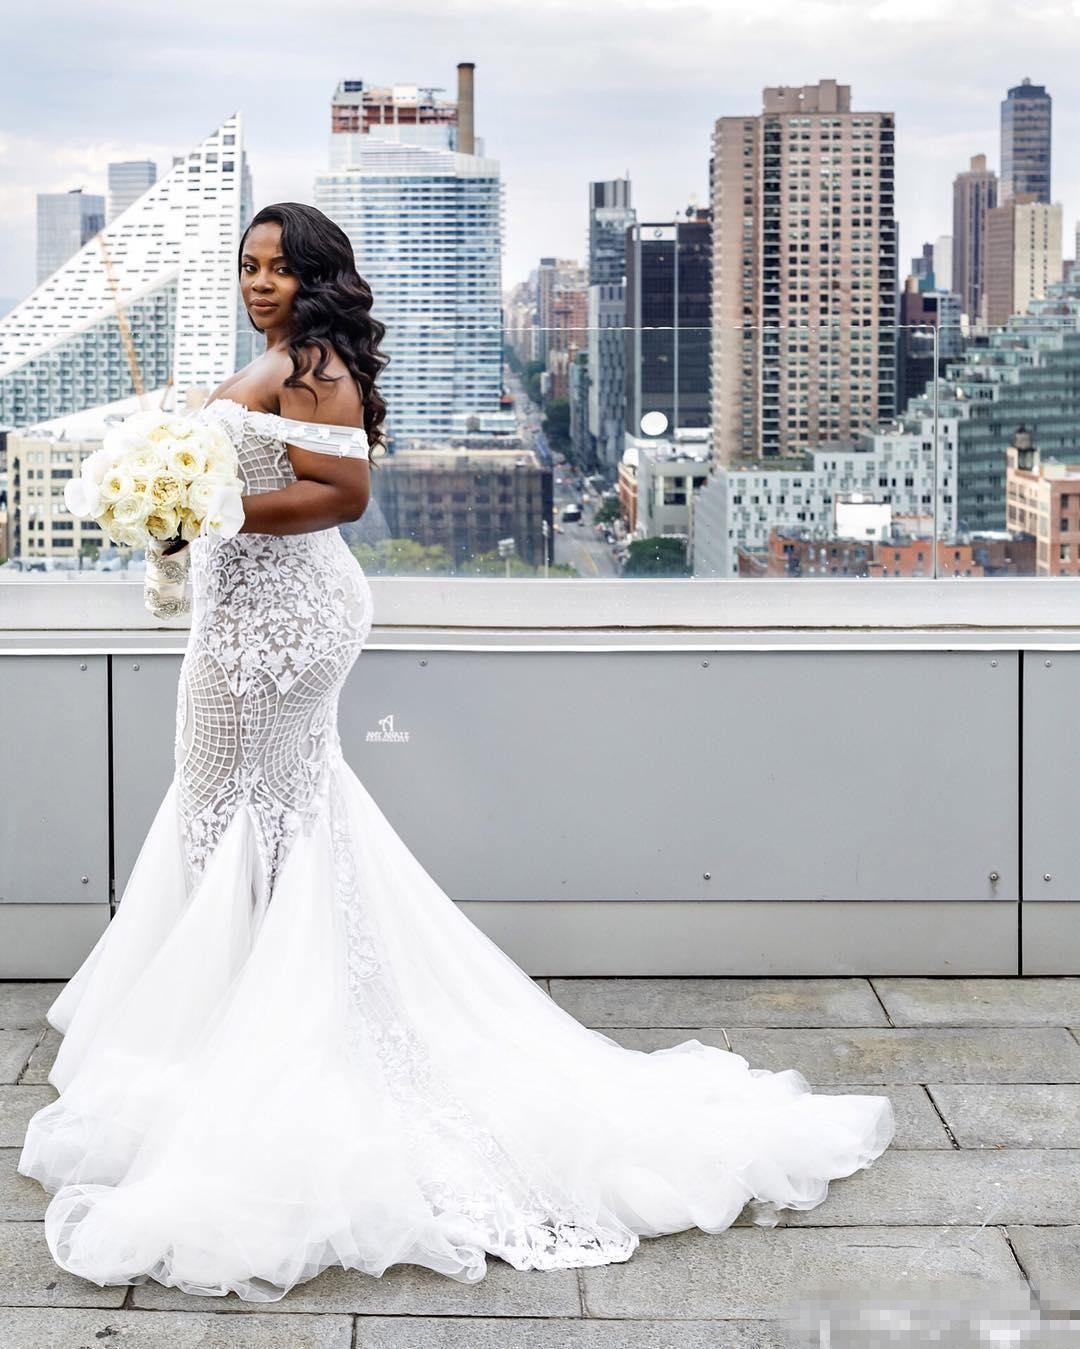 Custom Modest Plus Size Wedding Dresses Mermaid Off Shoulder Sweep Train Tulle Lac Australian Wedding Dress Designers Wedding Dress Styles Summer Wedding Dress [ 1349 x 1080 Pixel ]